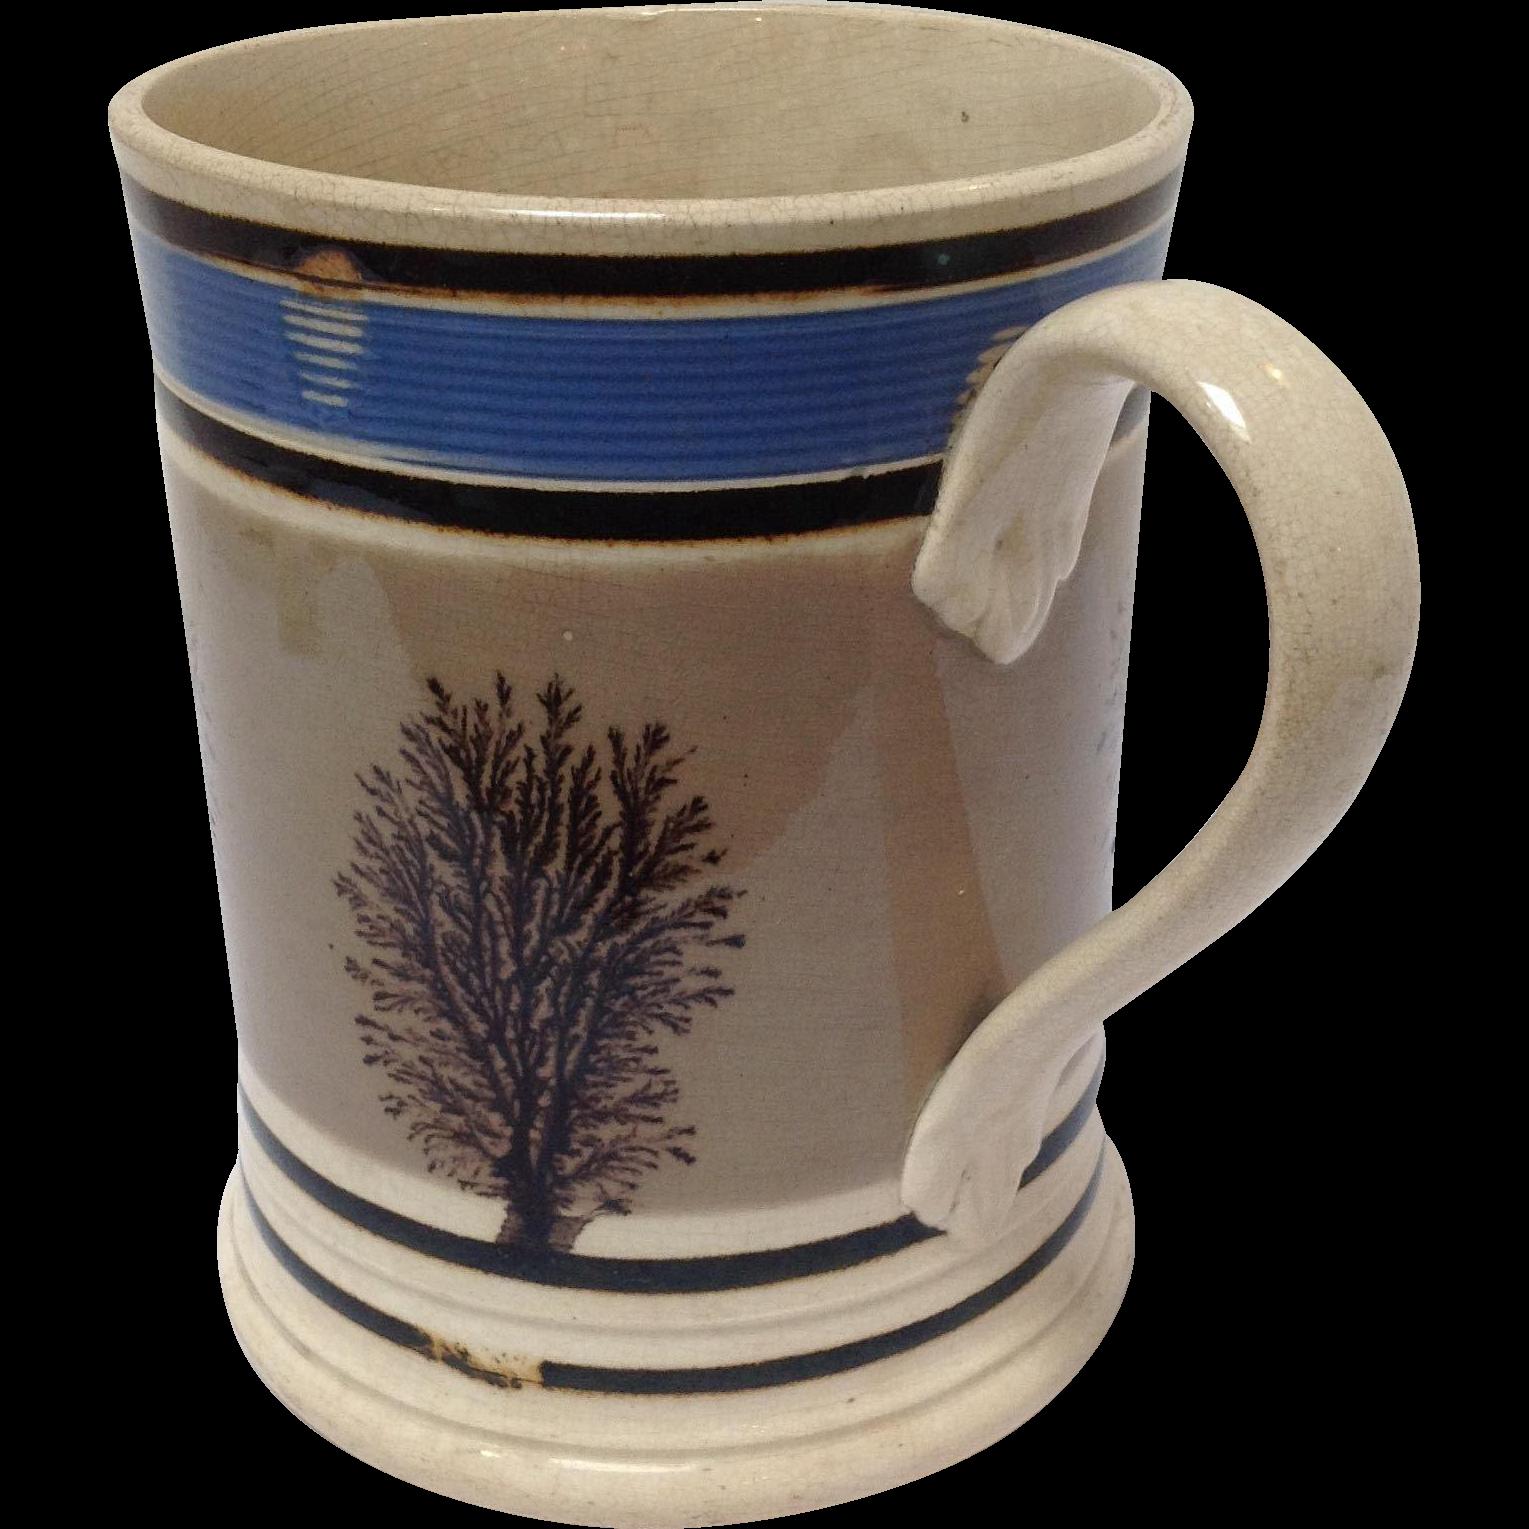 Mochaware Seaweed and Blue Mug English C. 1800u0026#39;s from antiquesofriveroaks on Ruby Lane